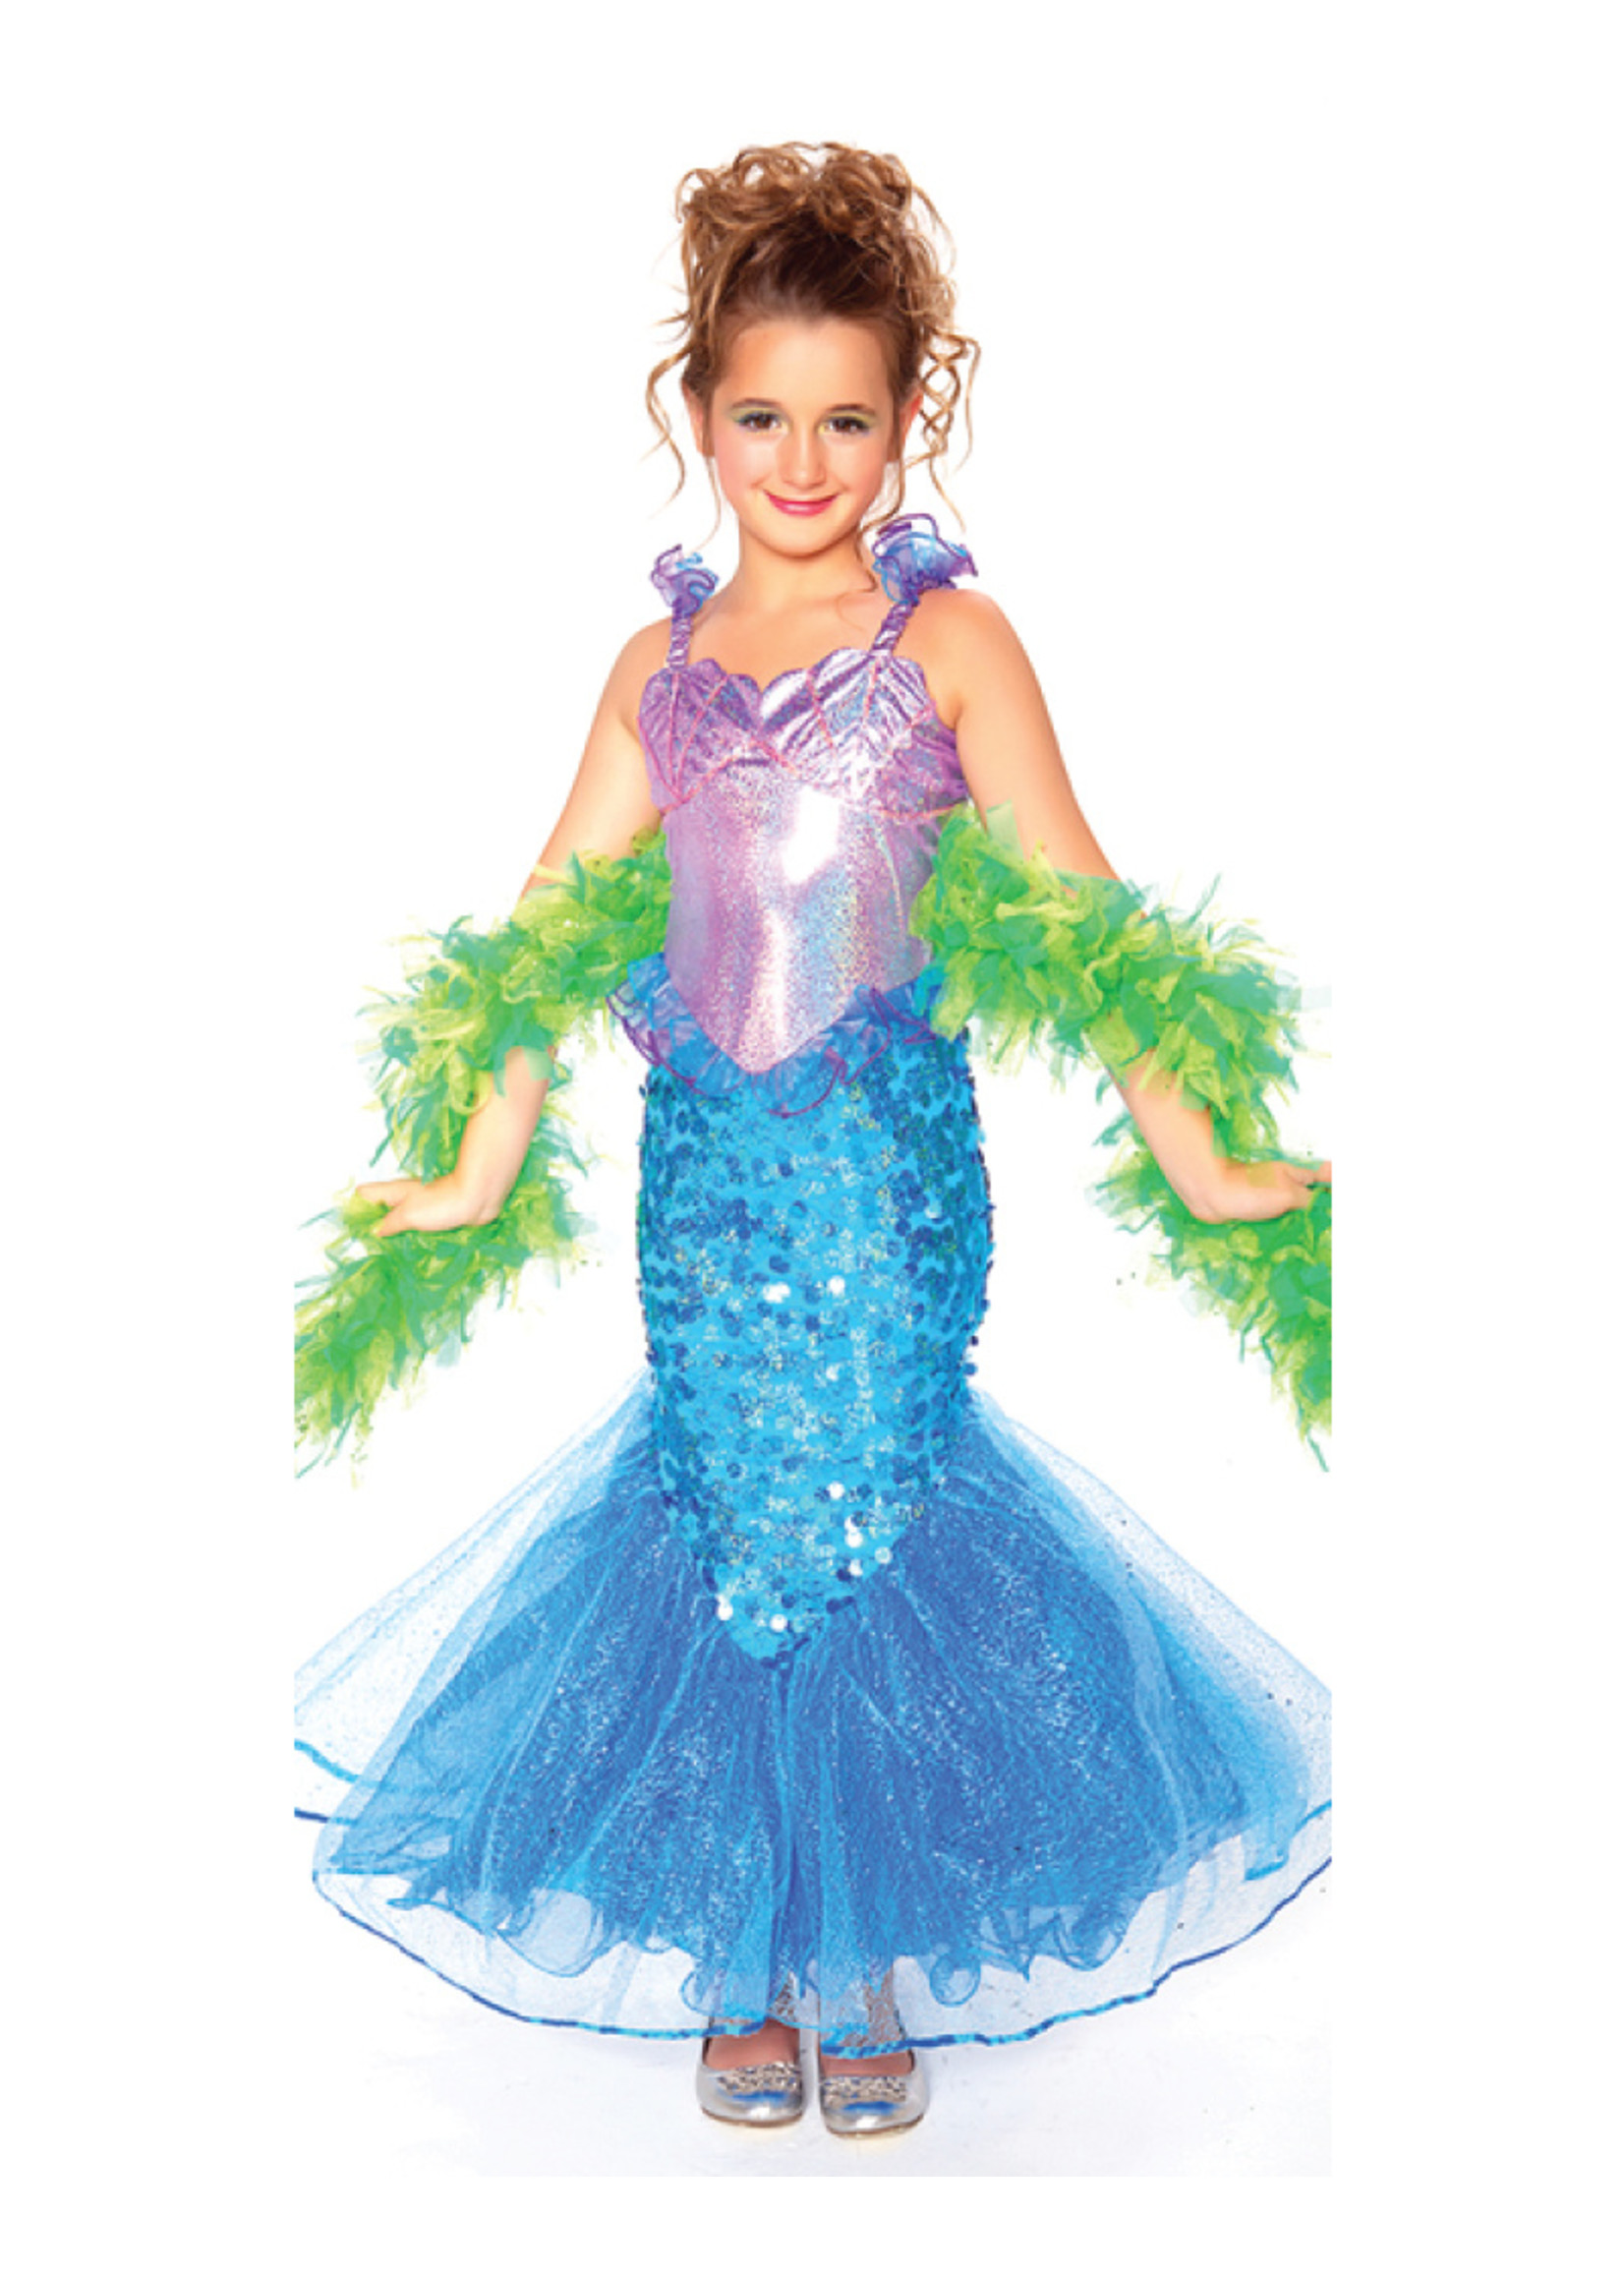 Mermaid with Boa - Girls